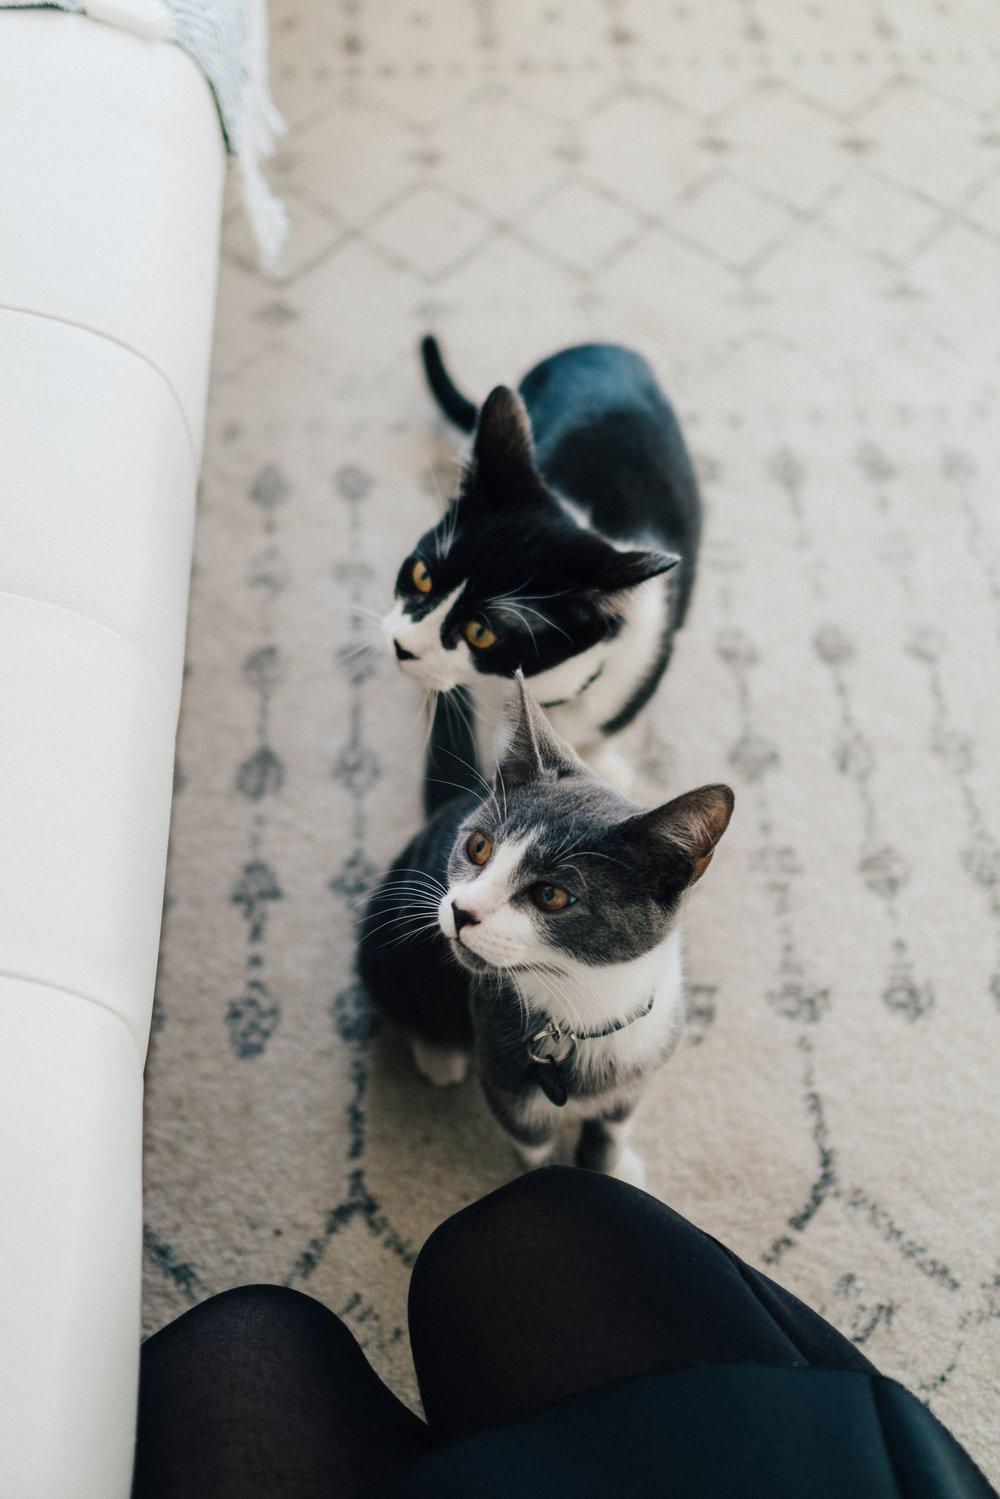 Yujin's kitties Olive and Violet